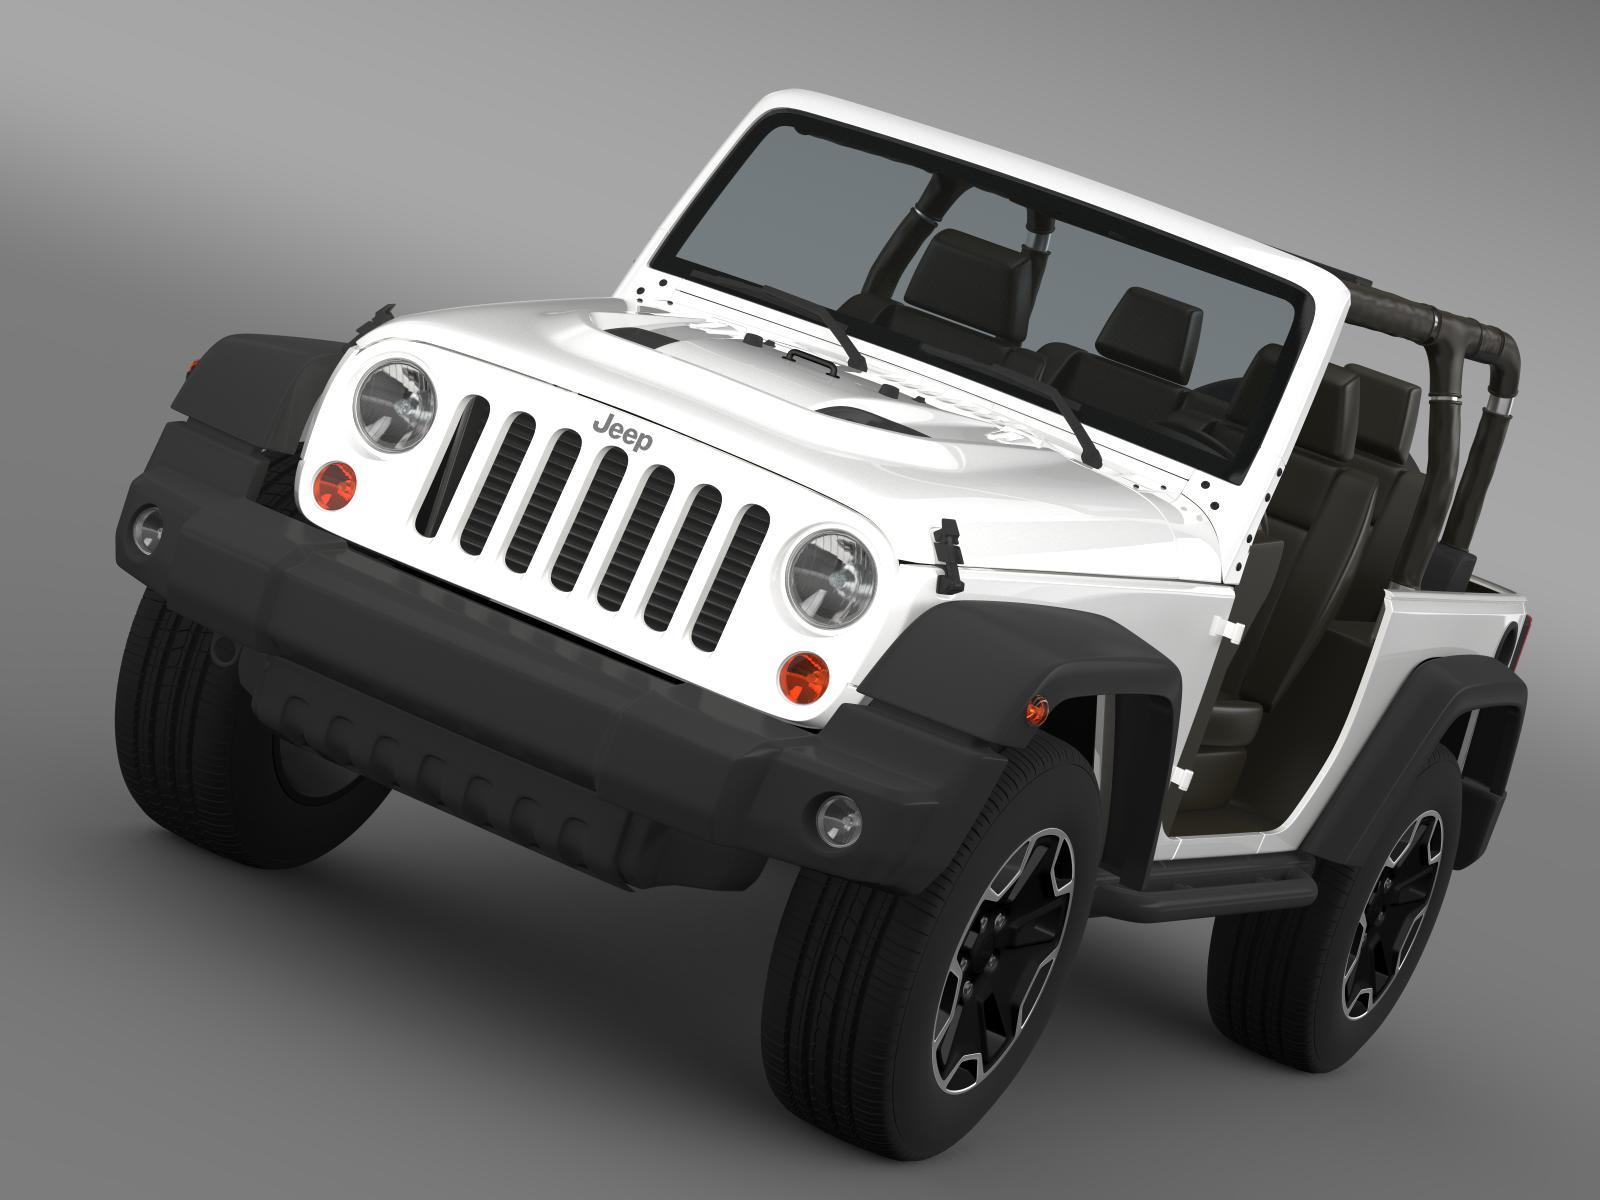 jeep wrangler rubicon 10th anniversary 2014 3d model 3ds max fbx c4d lwo ma mb hrc xsi obj 164827